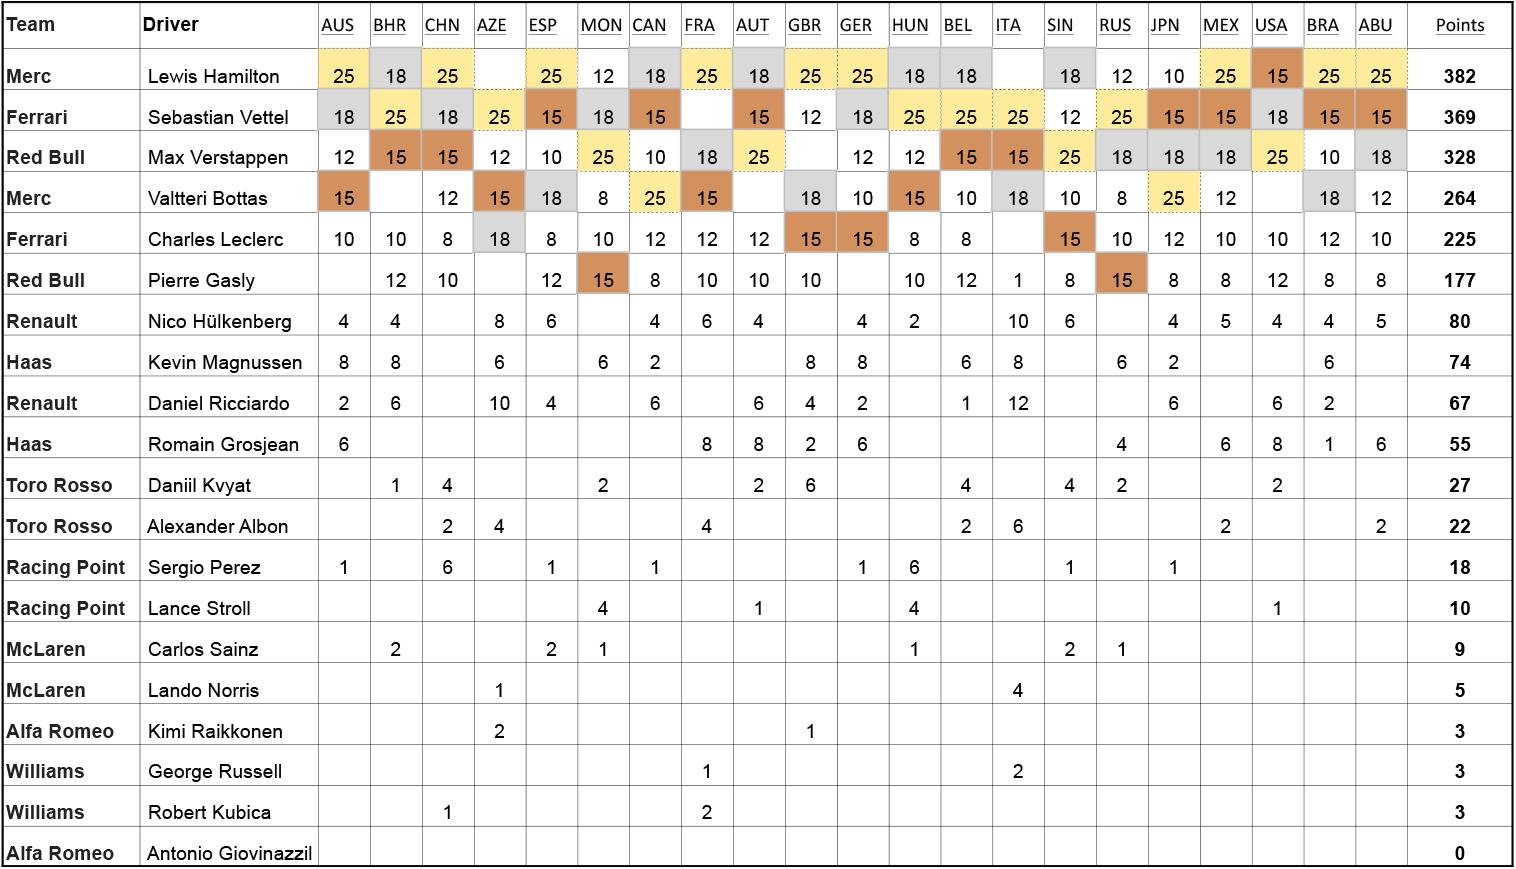 vintly_F1_2019_predictions.jpg